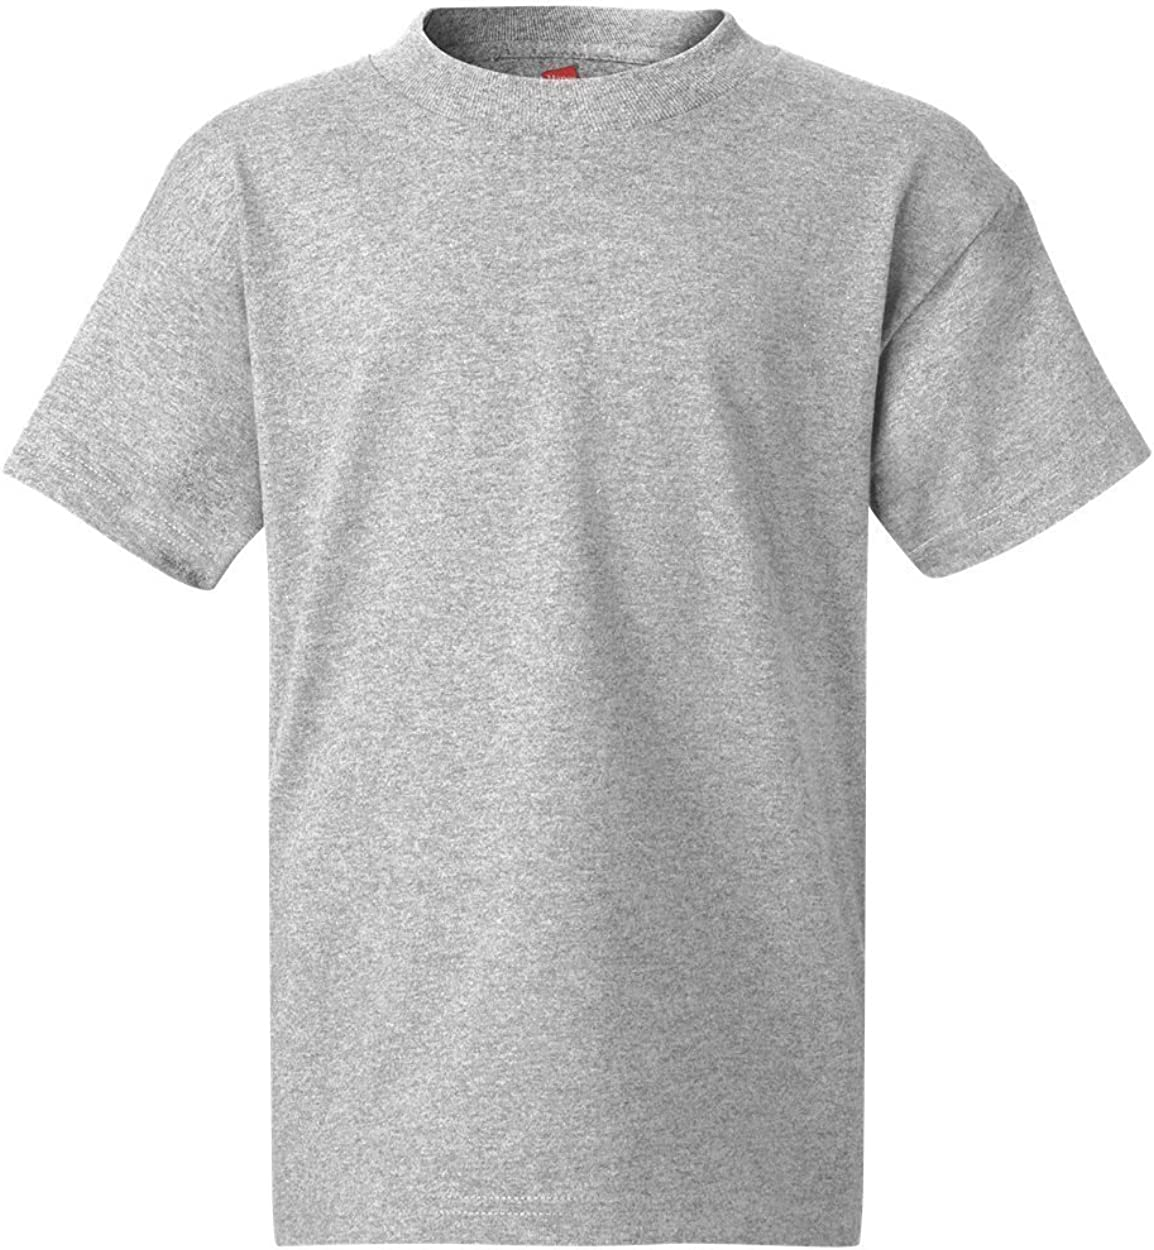 Hanes Authentic TAGLESS Kids' Cotton T-Shirt_Light Steel